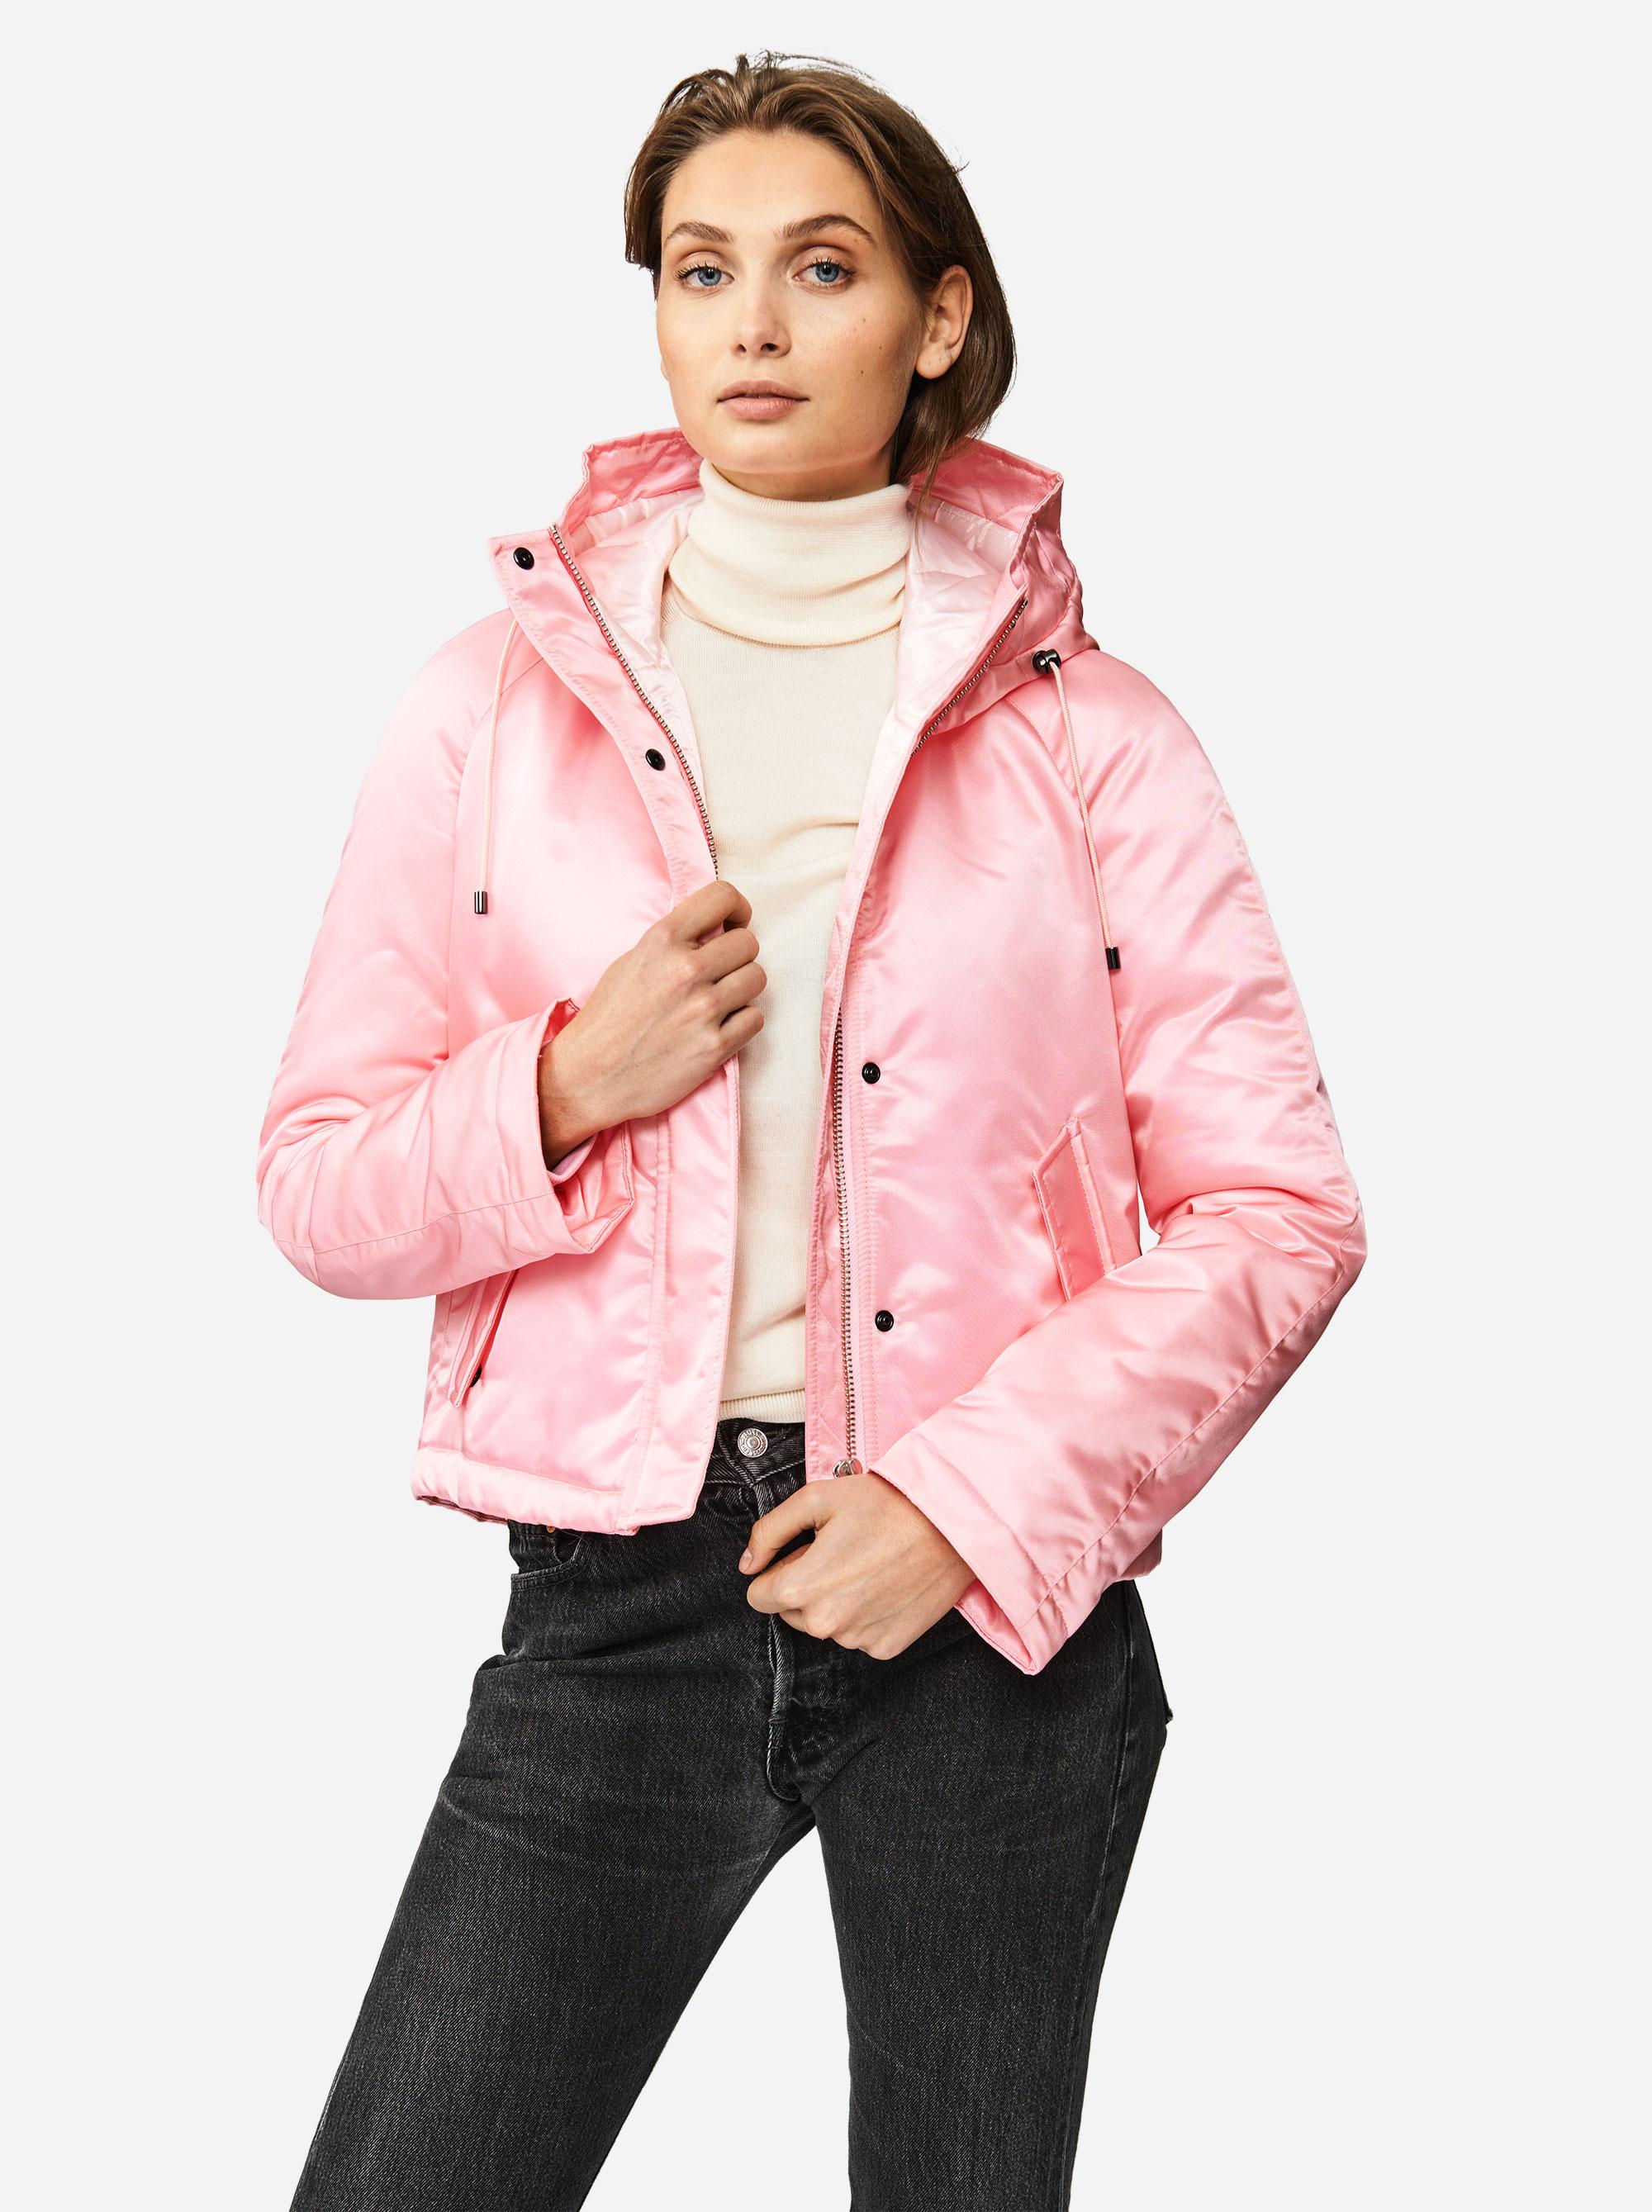 Teym - The Parka - Women - Pink - Short - 2